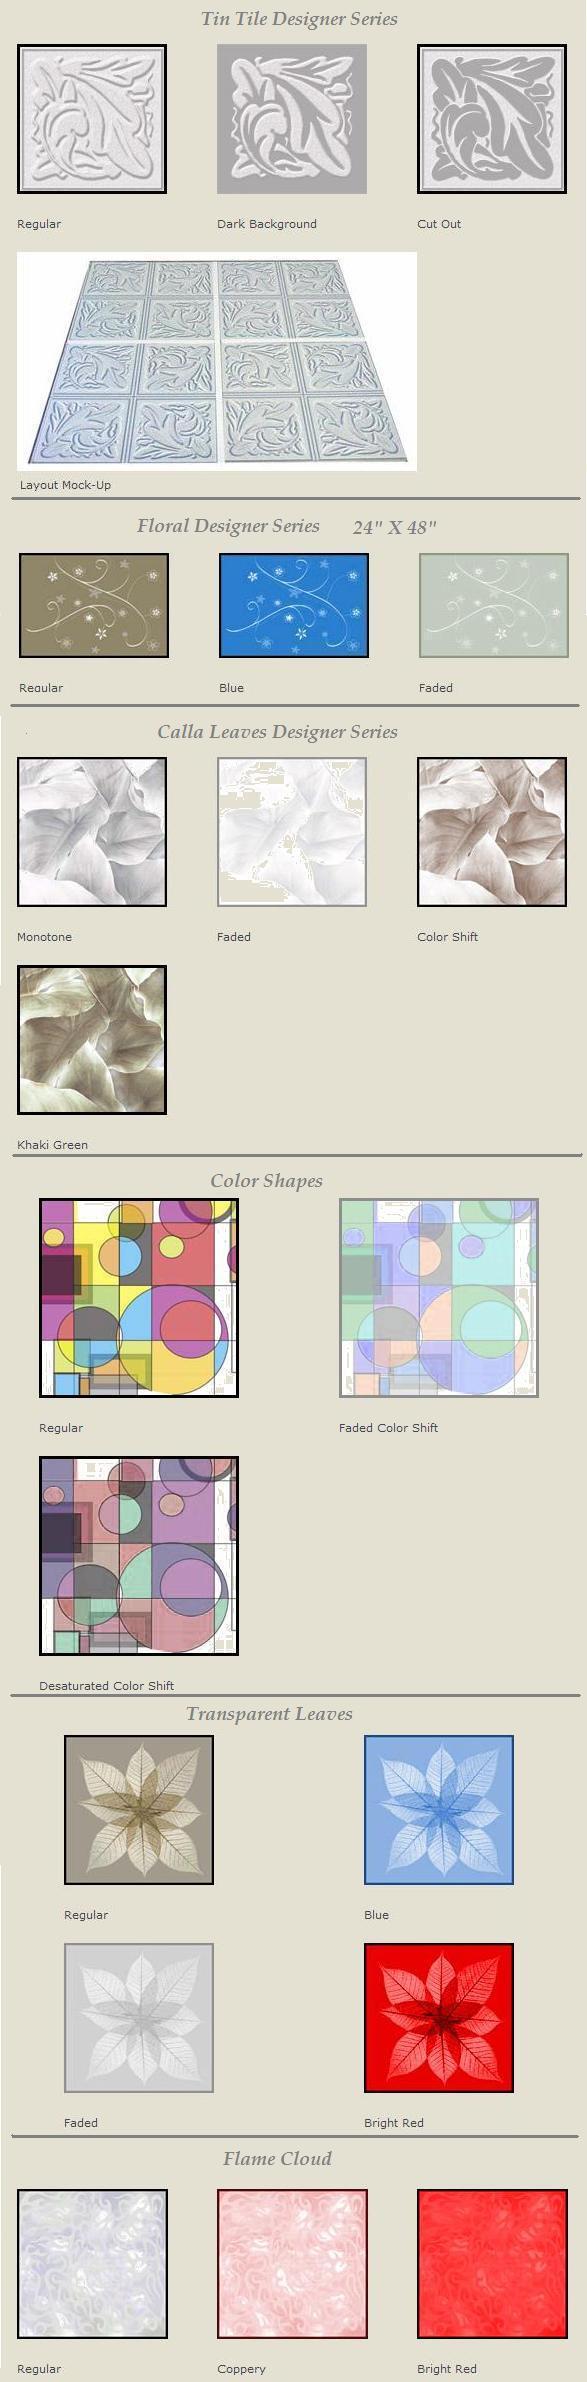 ceiling light lens images